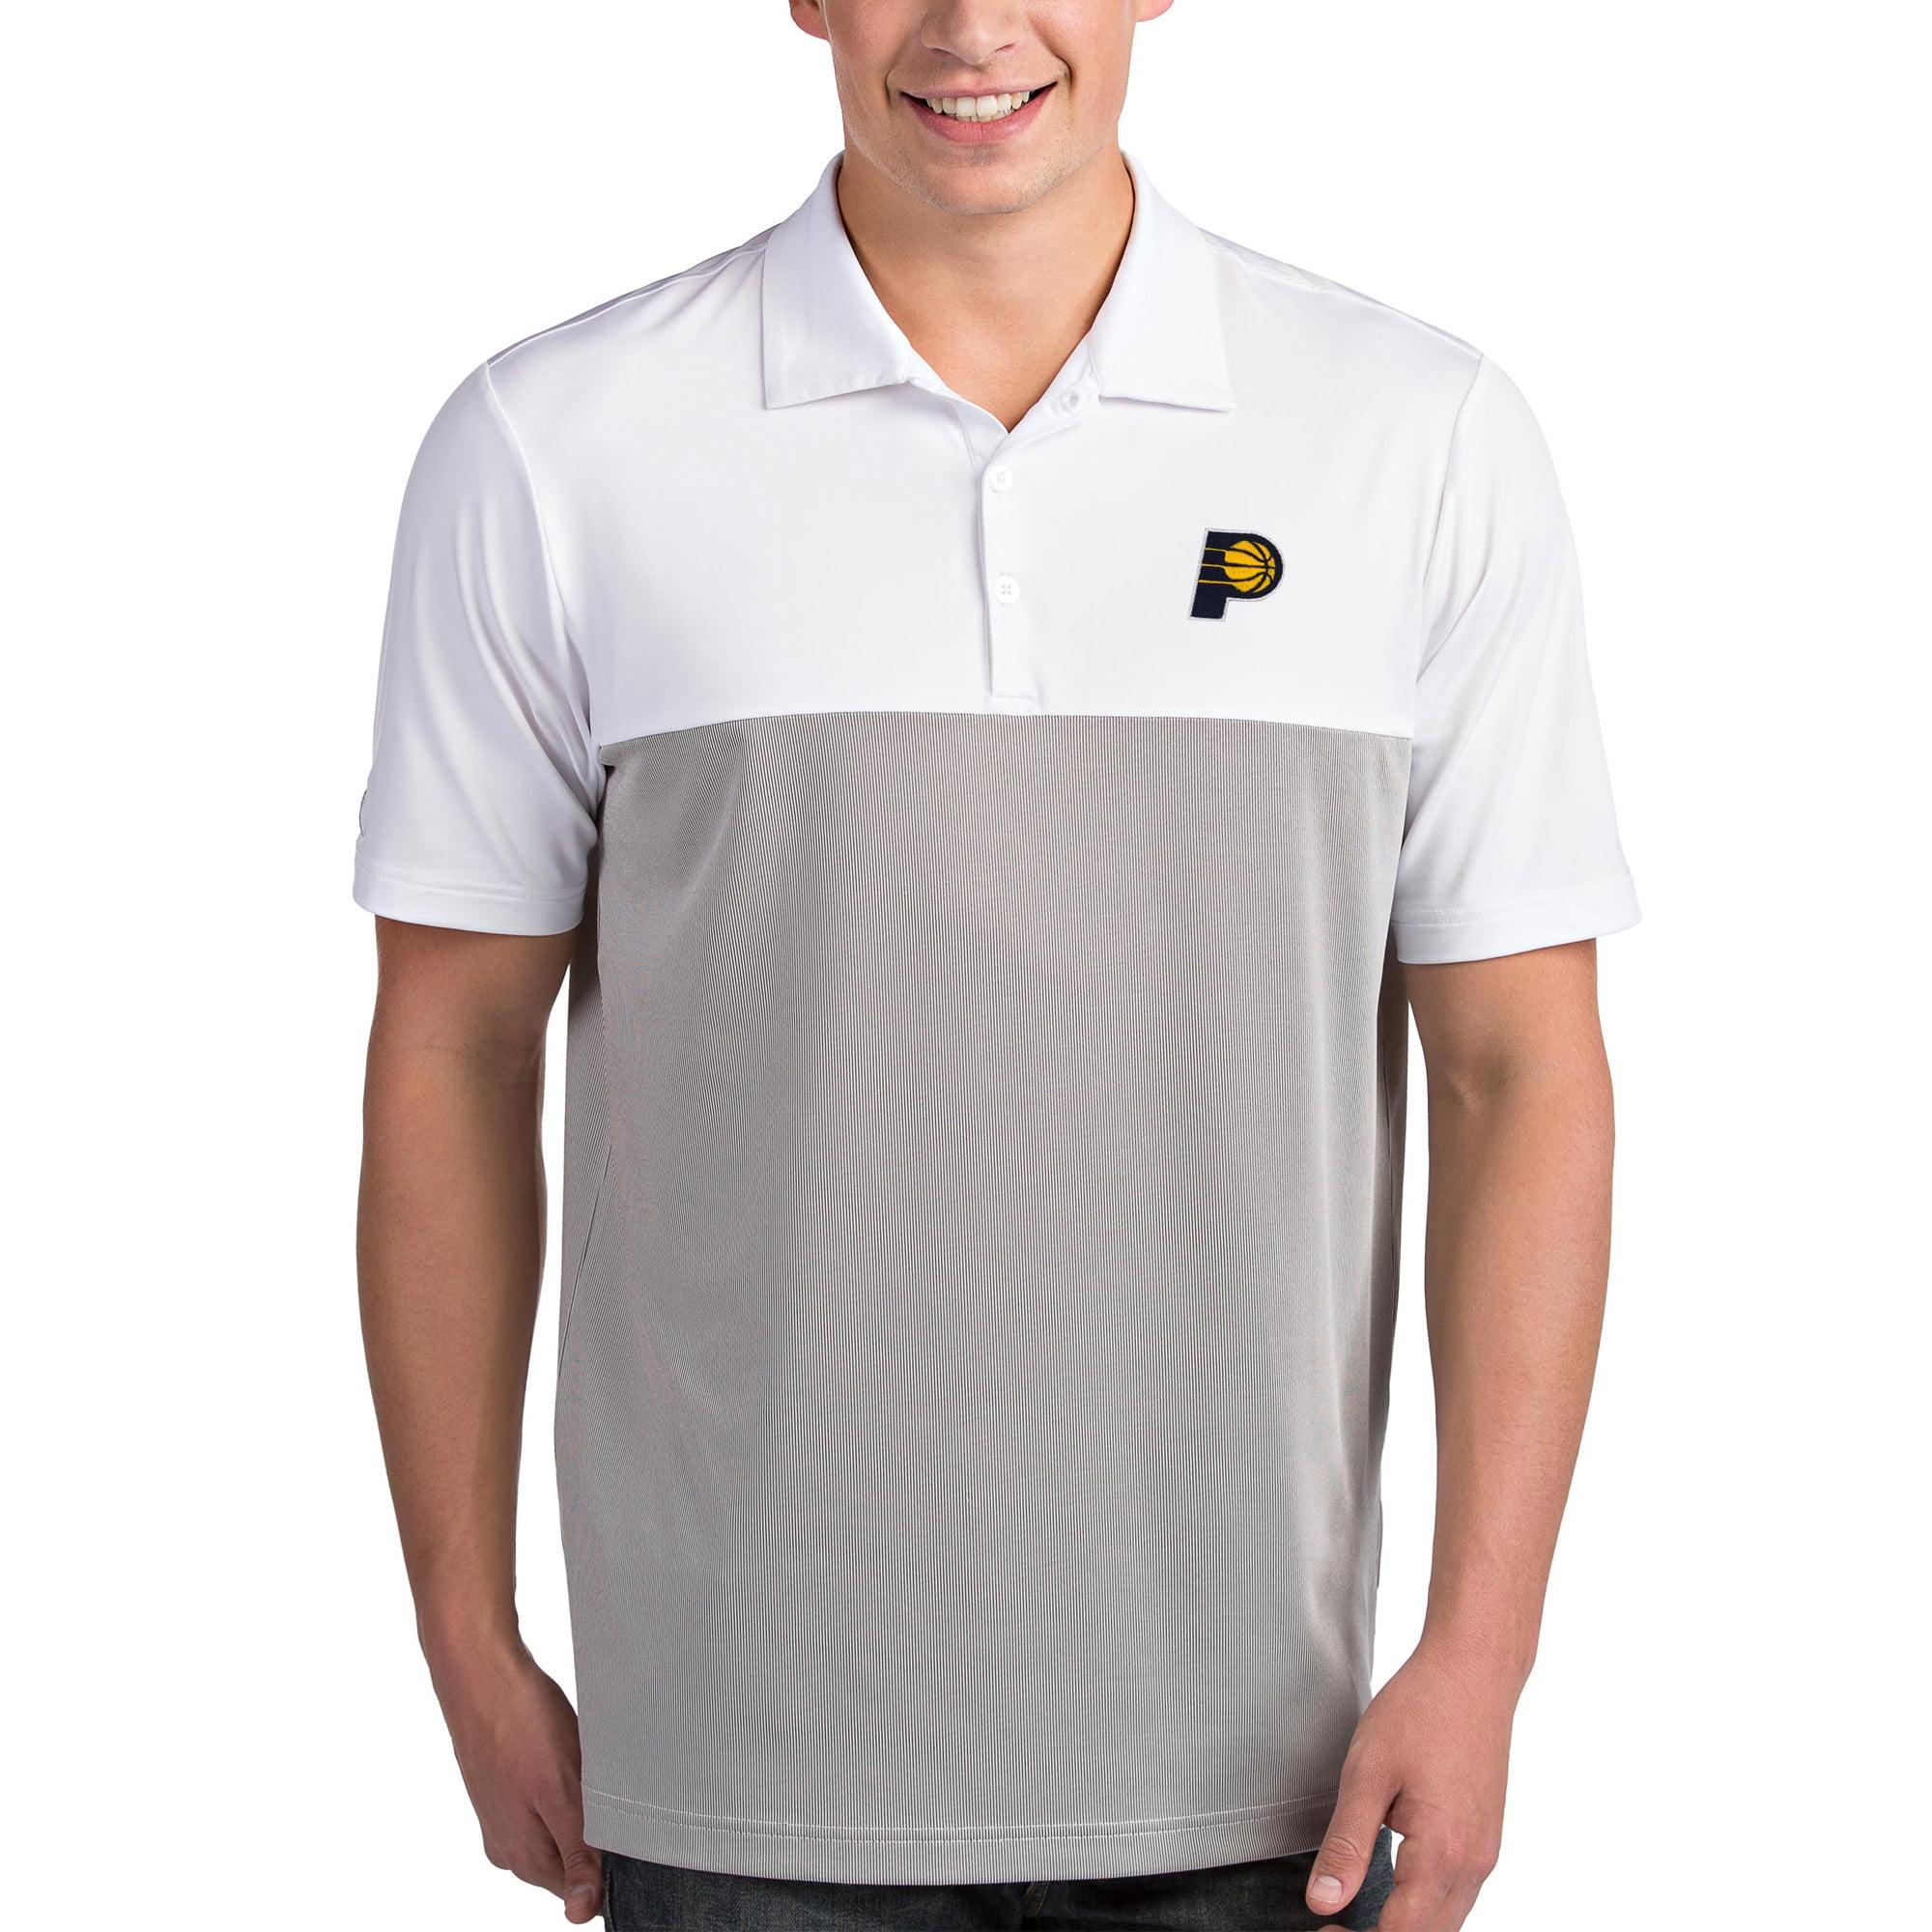 Indiana Pacers Antigua Venture Polo - White/Gray